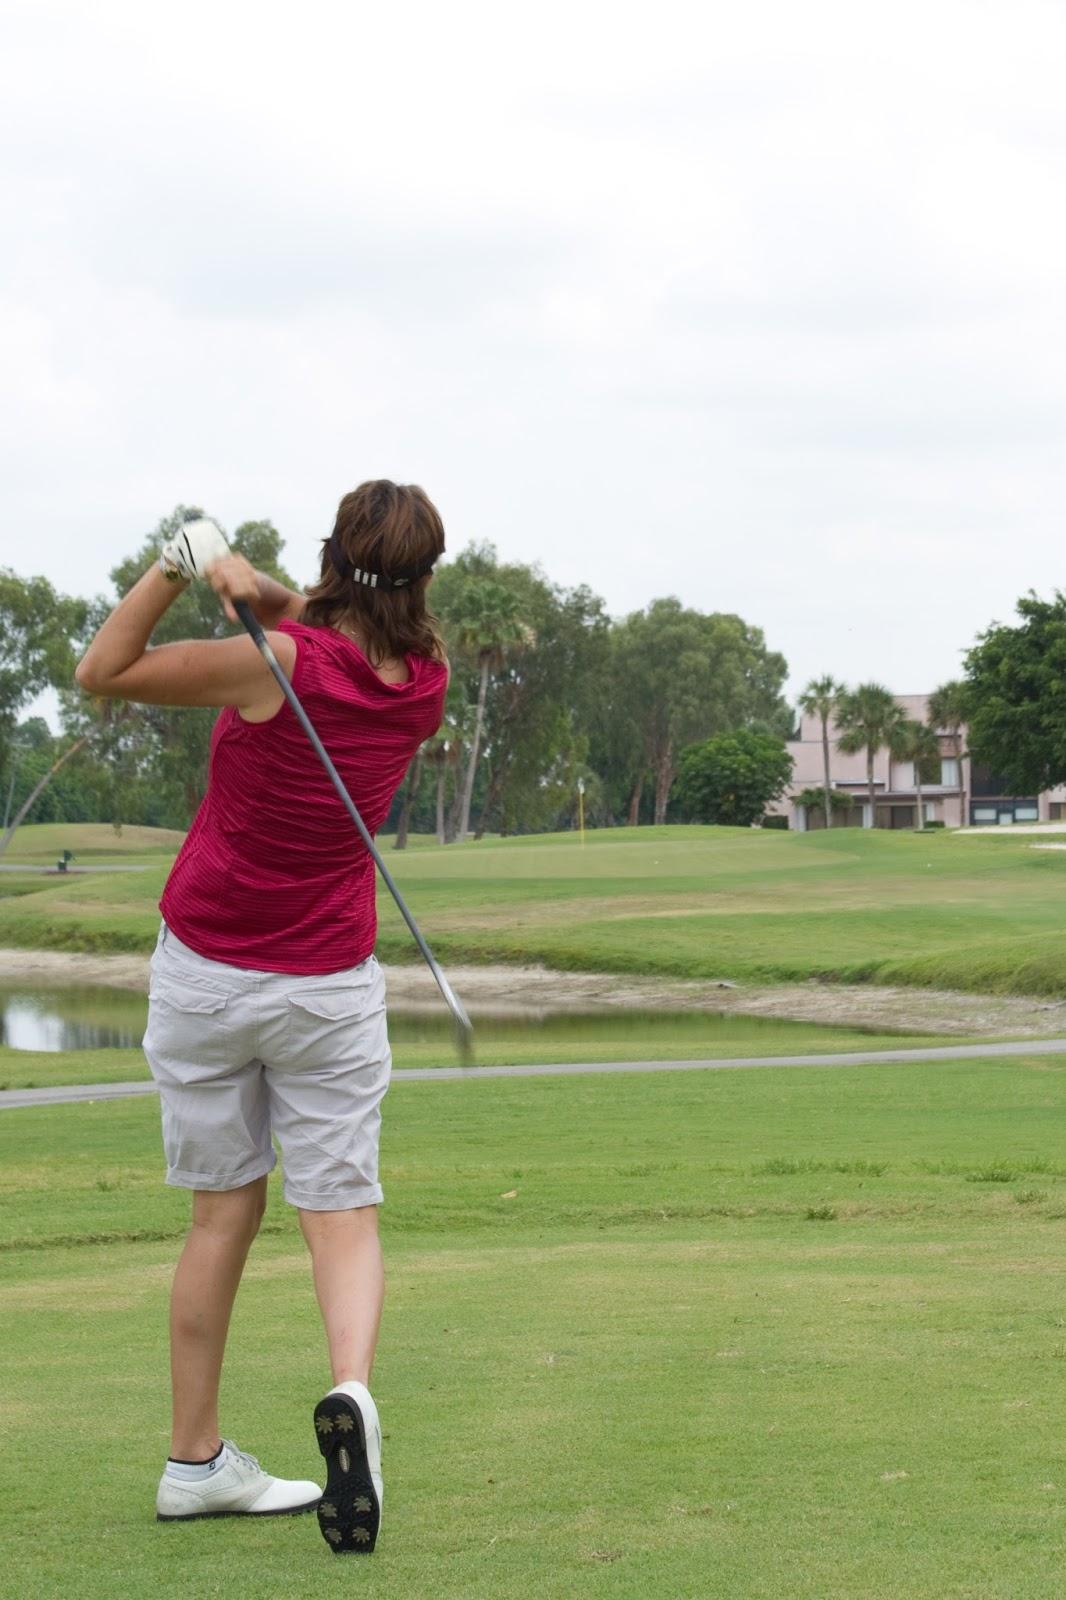 West Palm Beach Municipal Golf Club